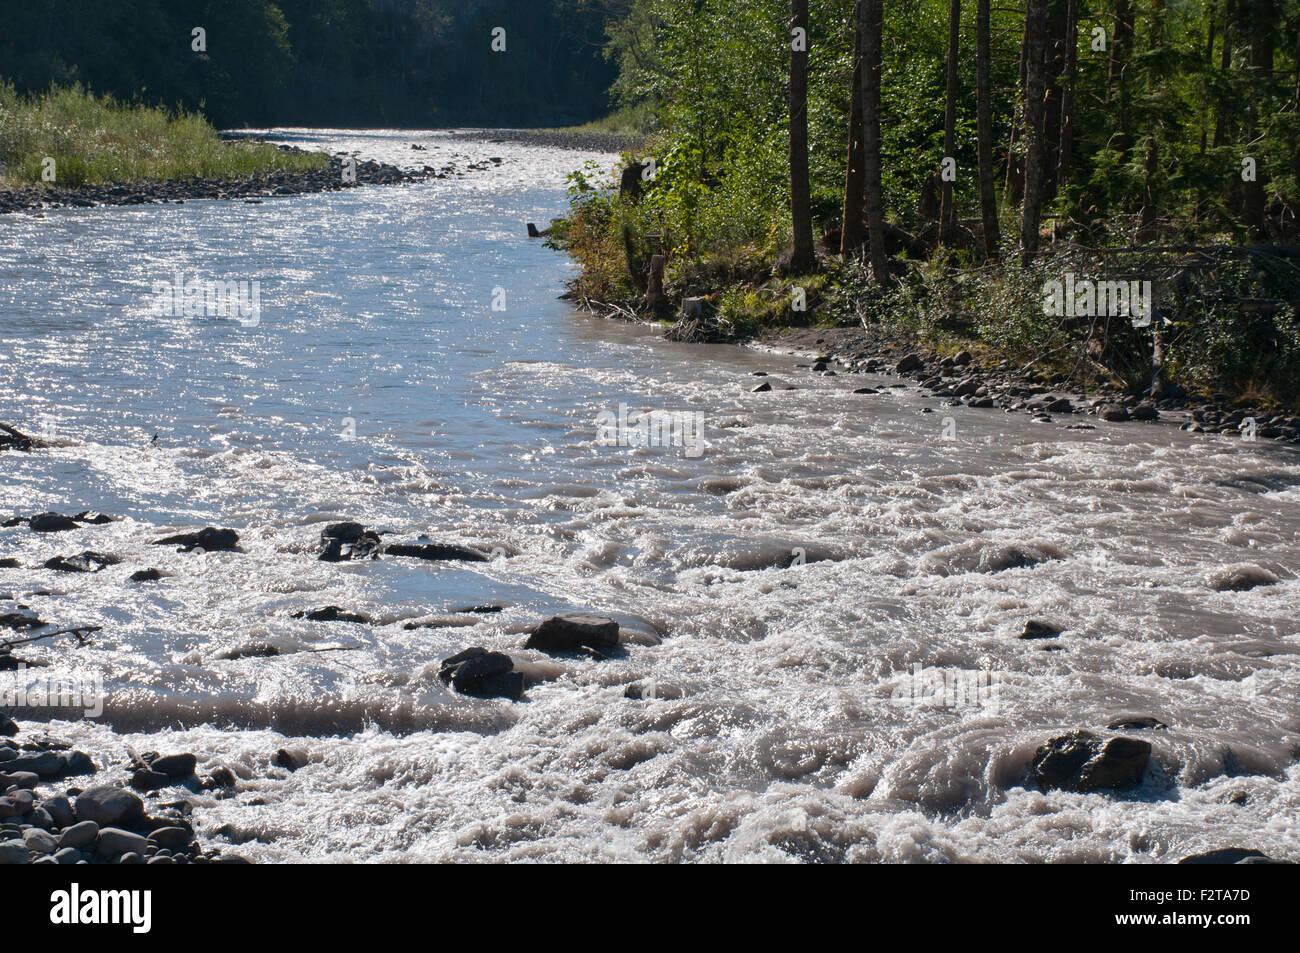 White river, Washington state, USA, Water, Curve - Stock Image